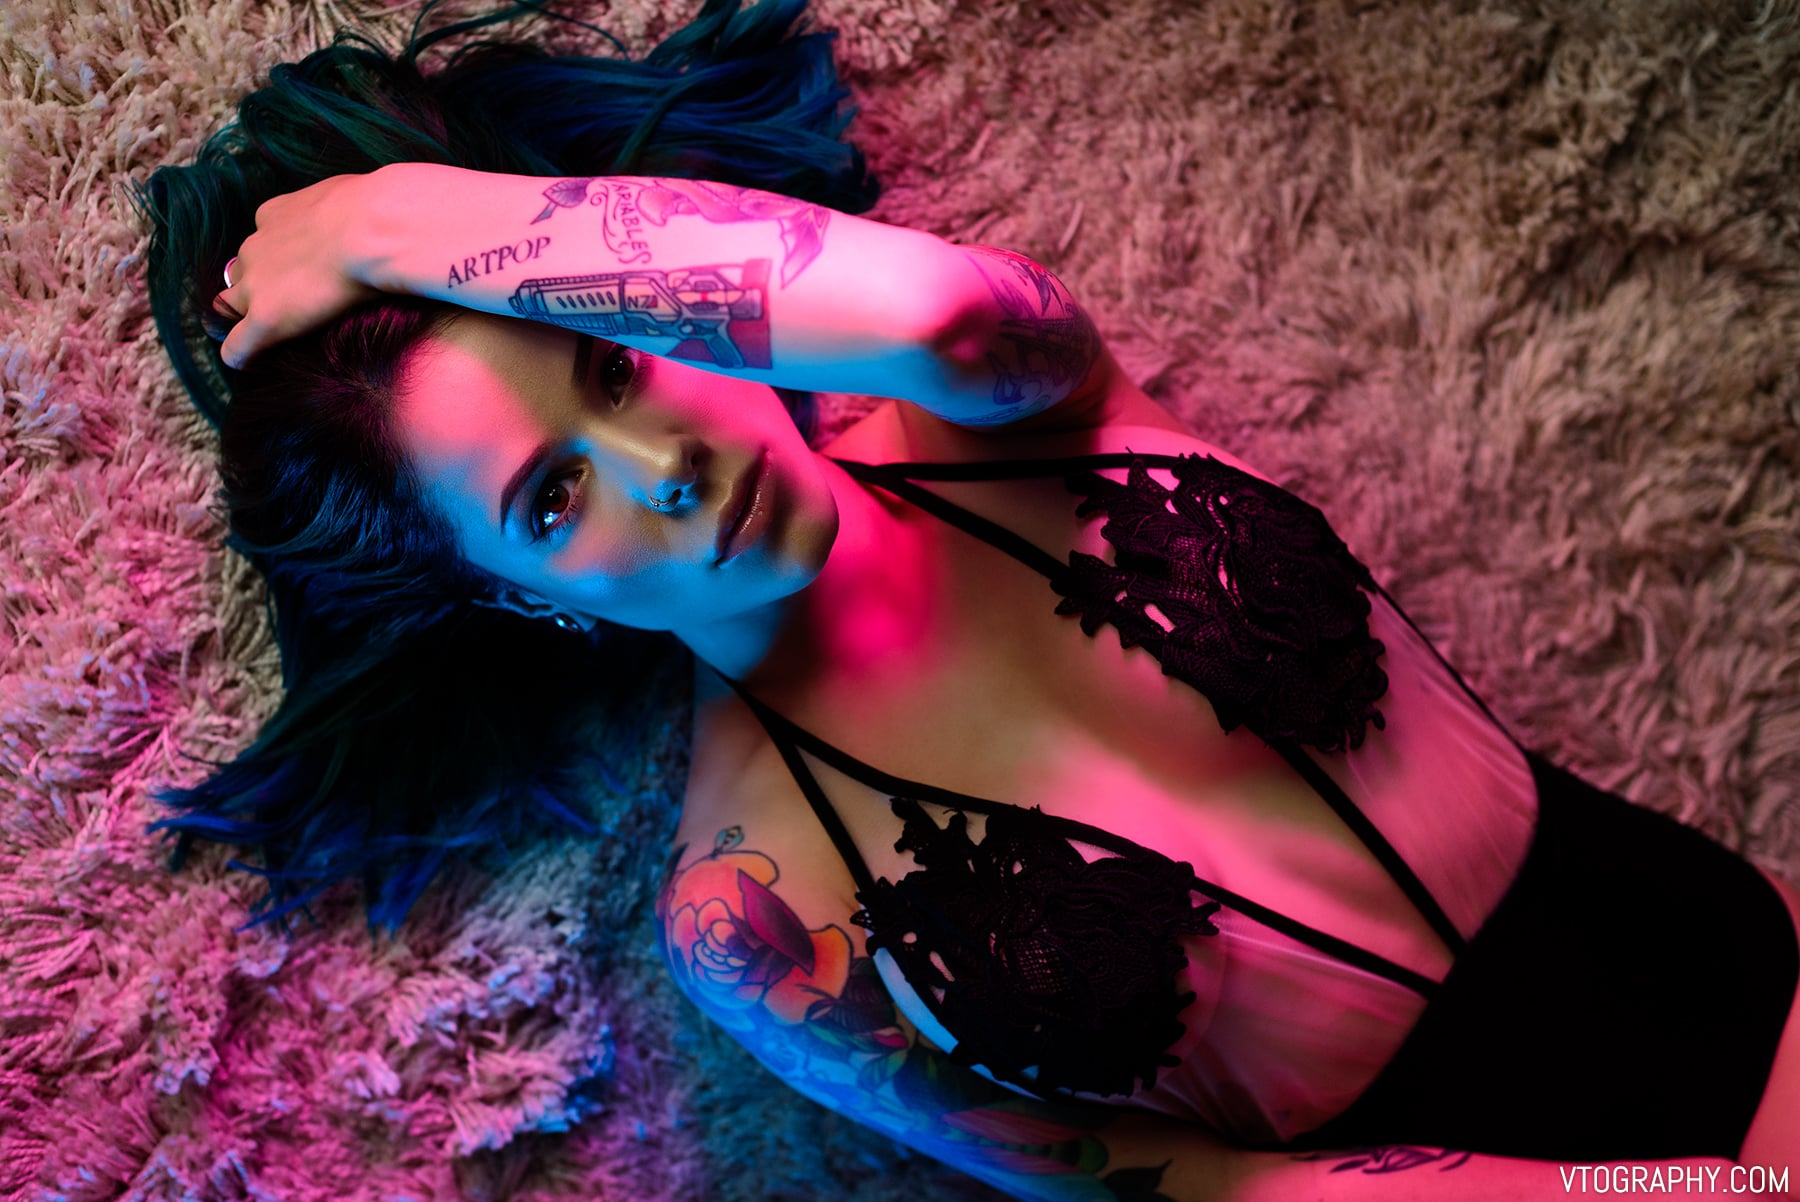 Cortana Blue photo shoot using LED panels